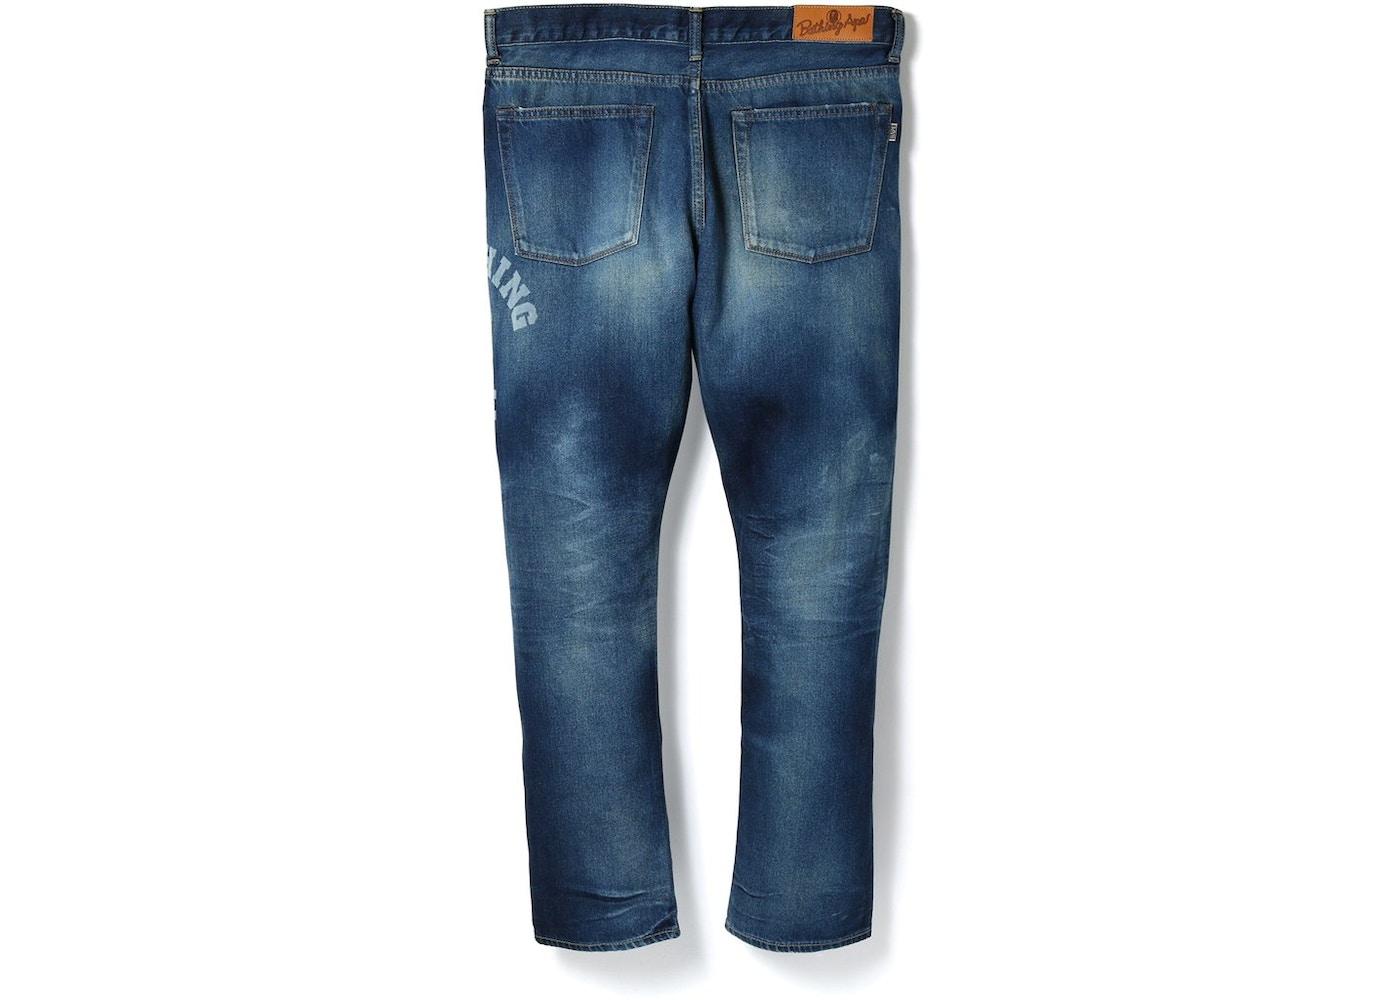 7dbeb78f3fe5 BAPE 1999 Type-05 Damage Denim Pants Indigo - FW18